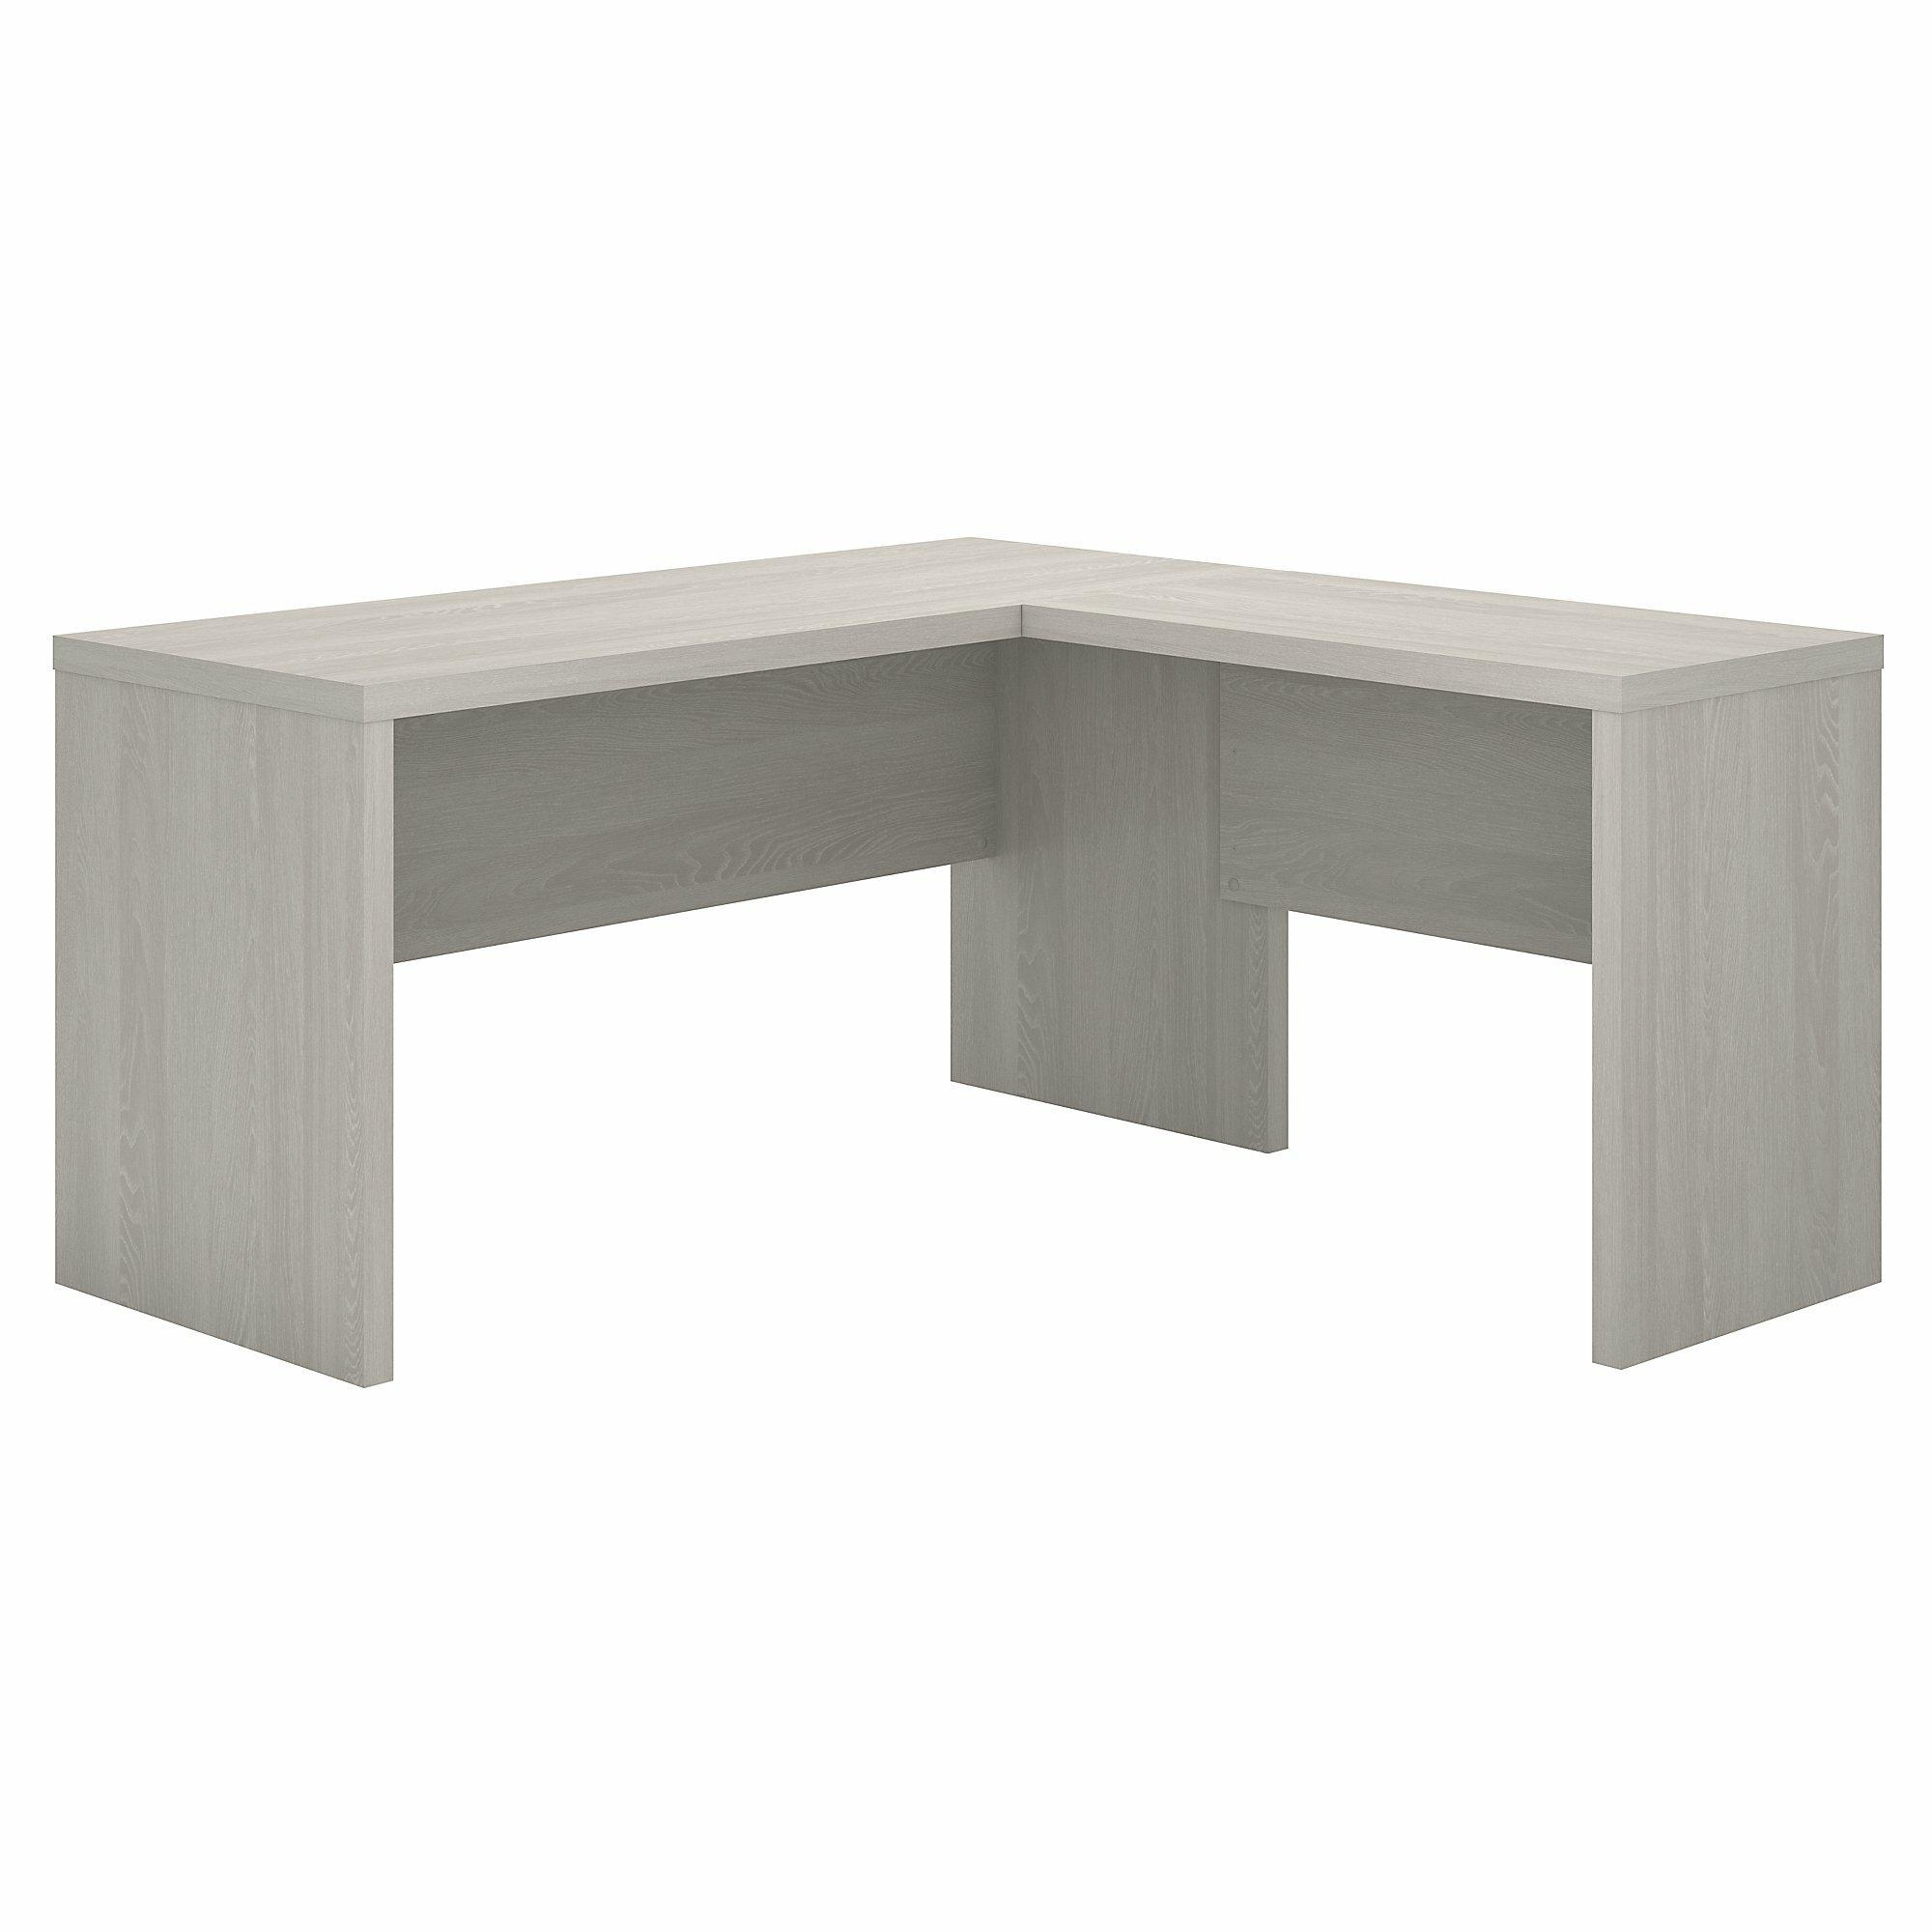 Miraculous Echo L Shaped Desk Shell Download Free Architecture Designs Intelgarnamadebymaigaardcom